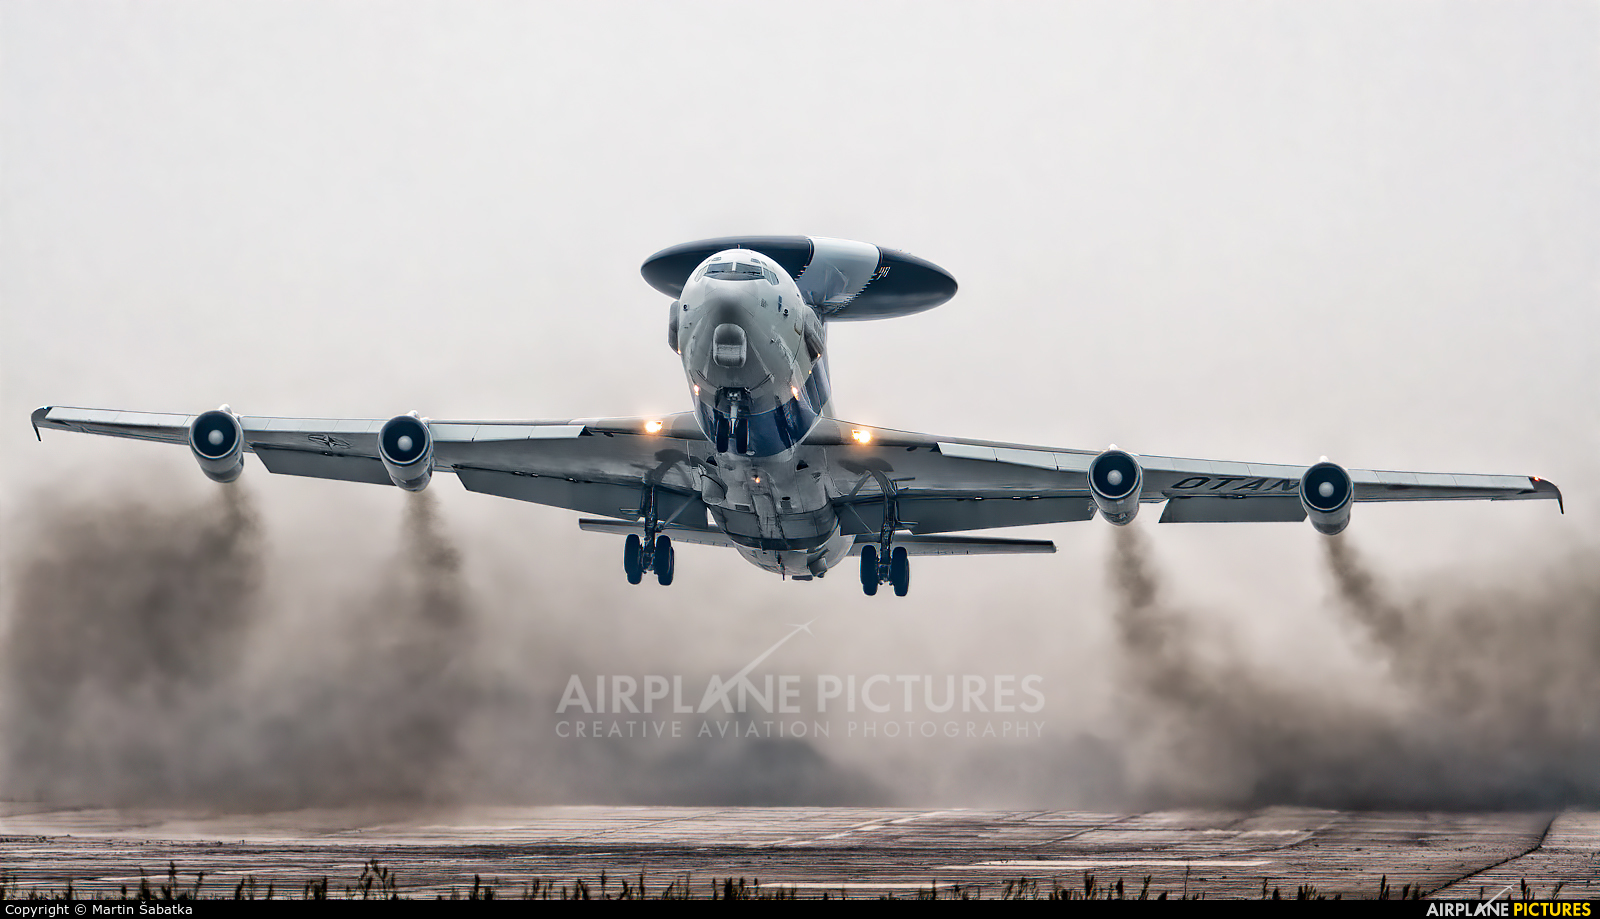 NATO LX-N90450 aircraft at Pardubice